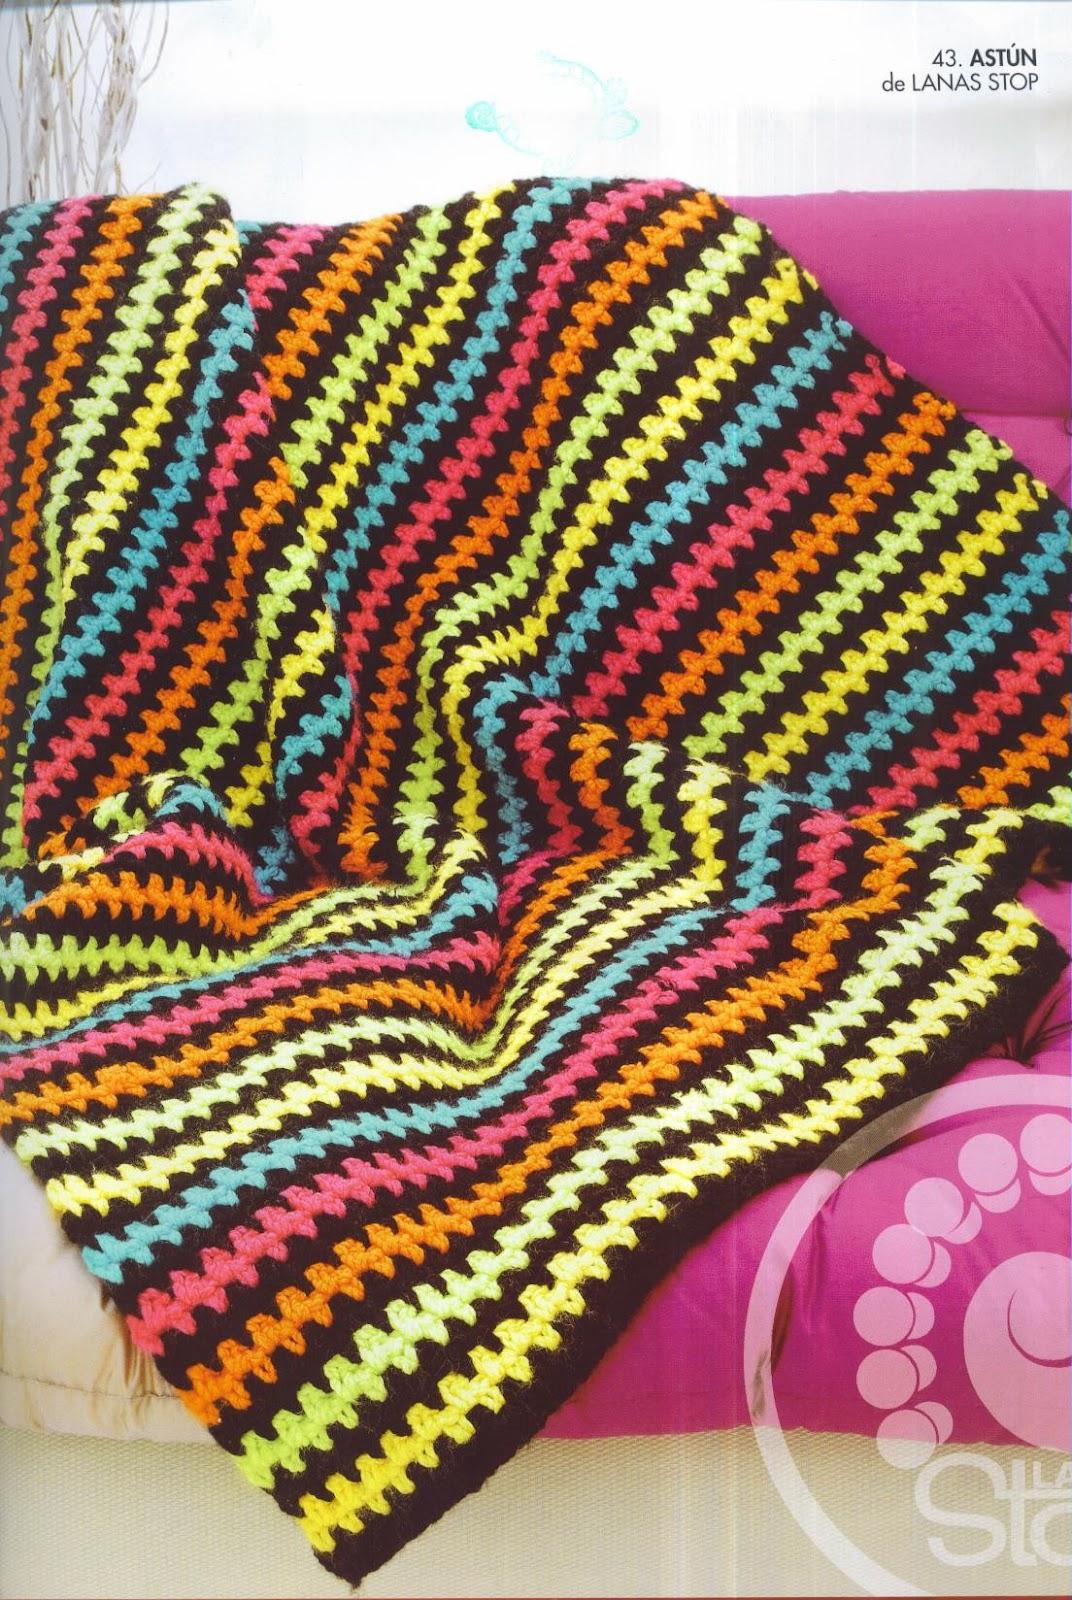 Patrones asgaya manta a rayas a crochet - Mantas de crochet a cuadros ...